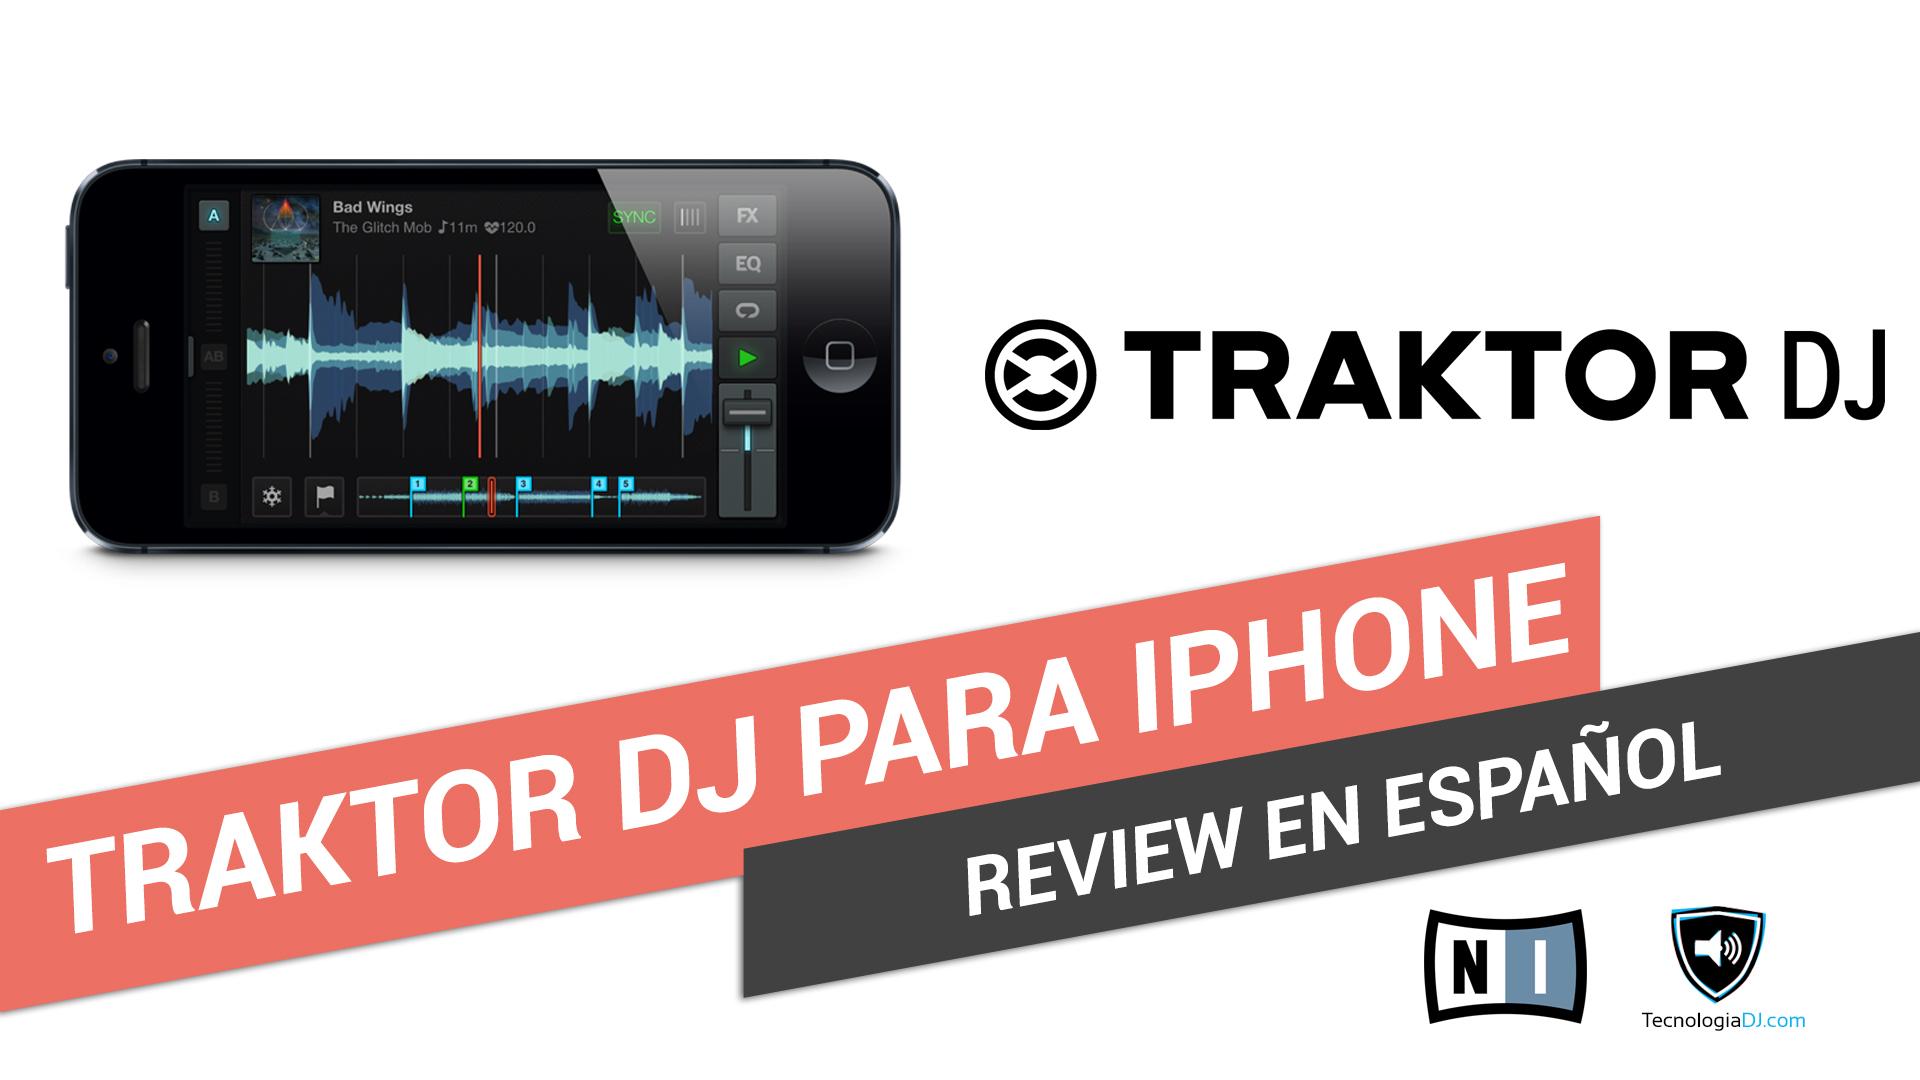 Review en español Traktor DJ para iPhone